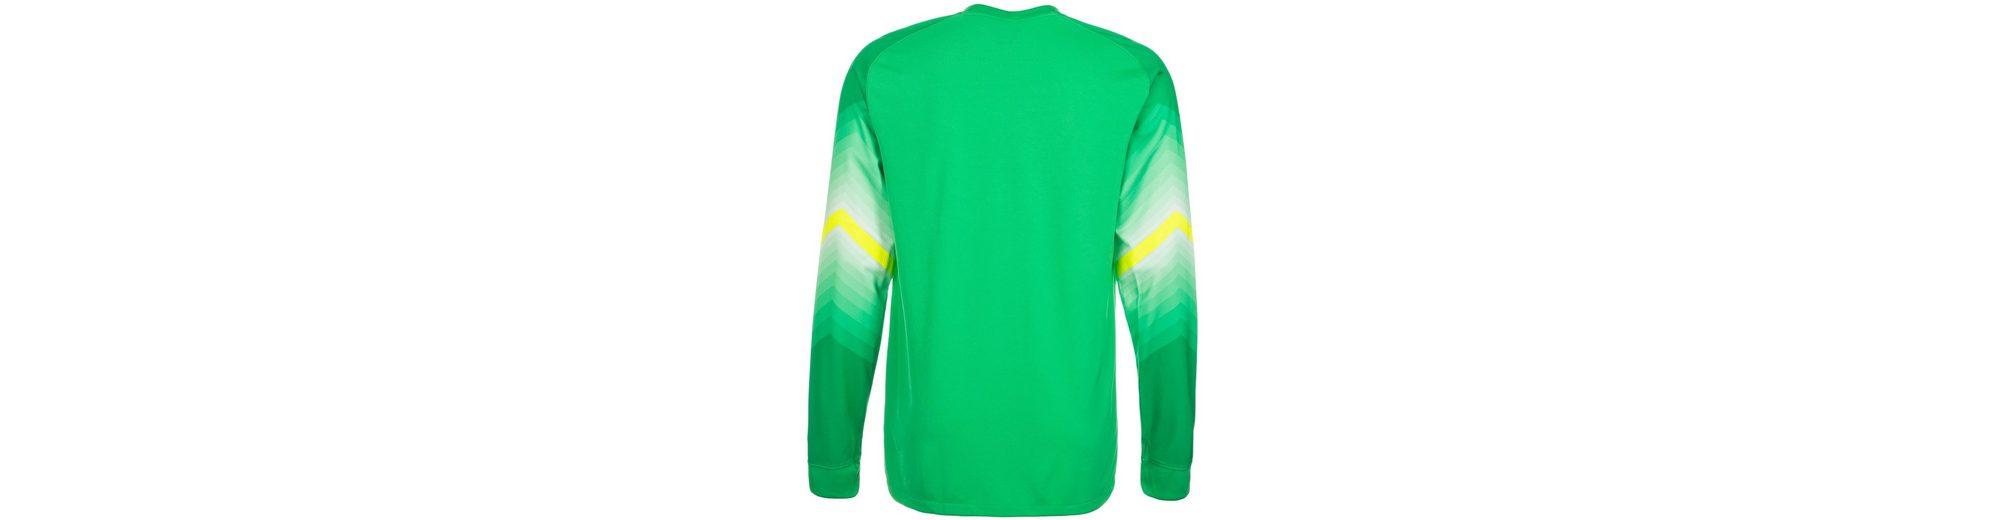 Nike Goleiro Torwarttrikot Herren Billig Verkauf Offizielle Seite XuRQd5BEg